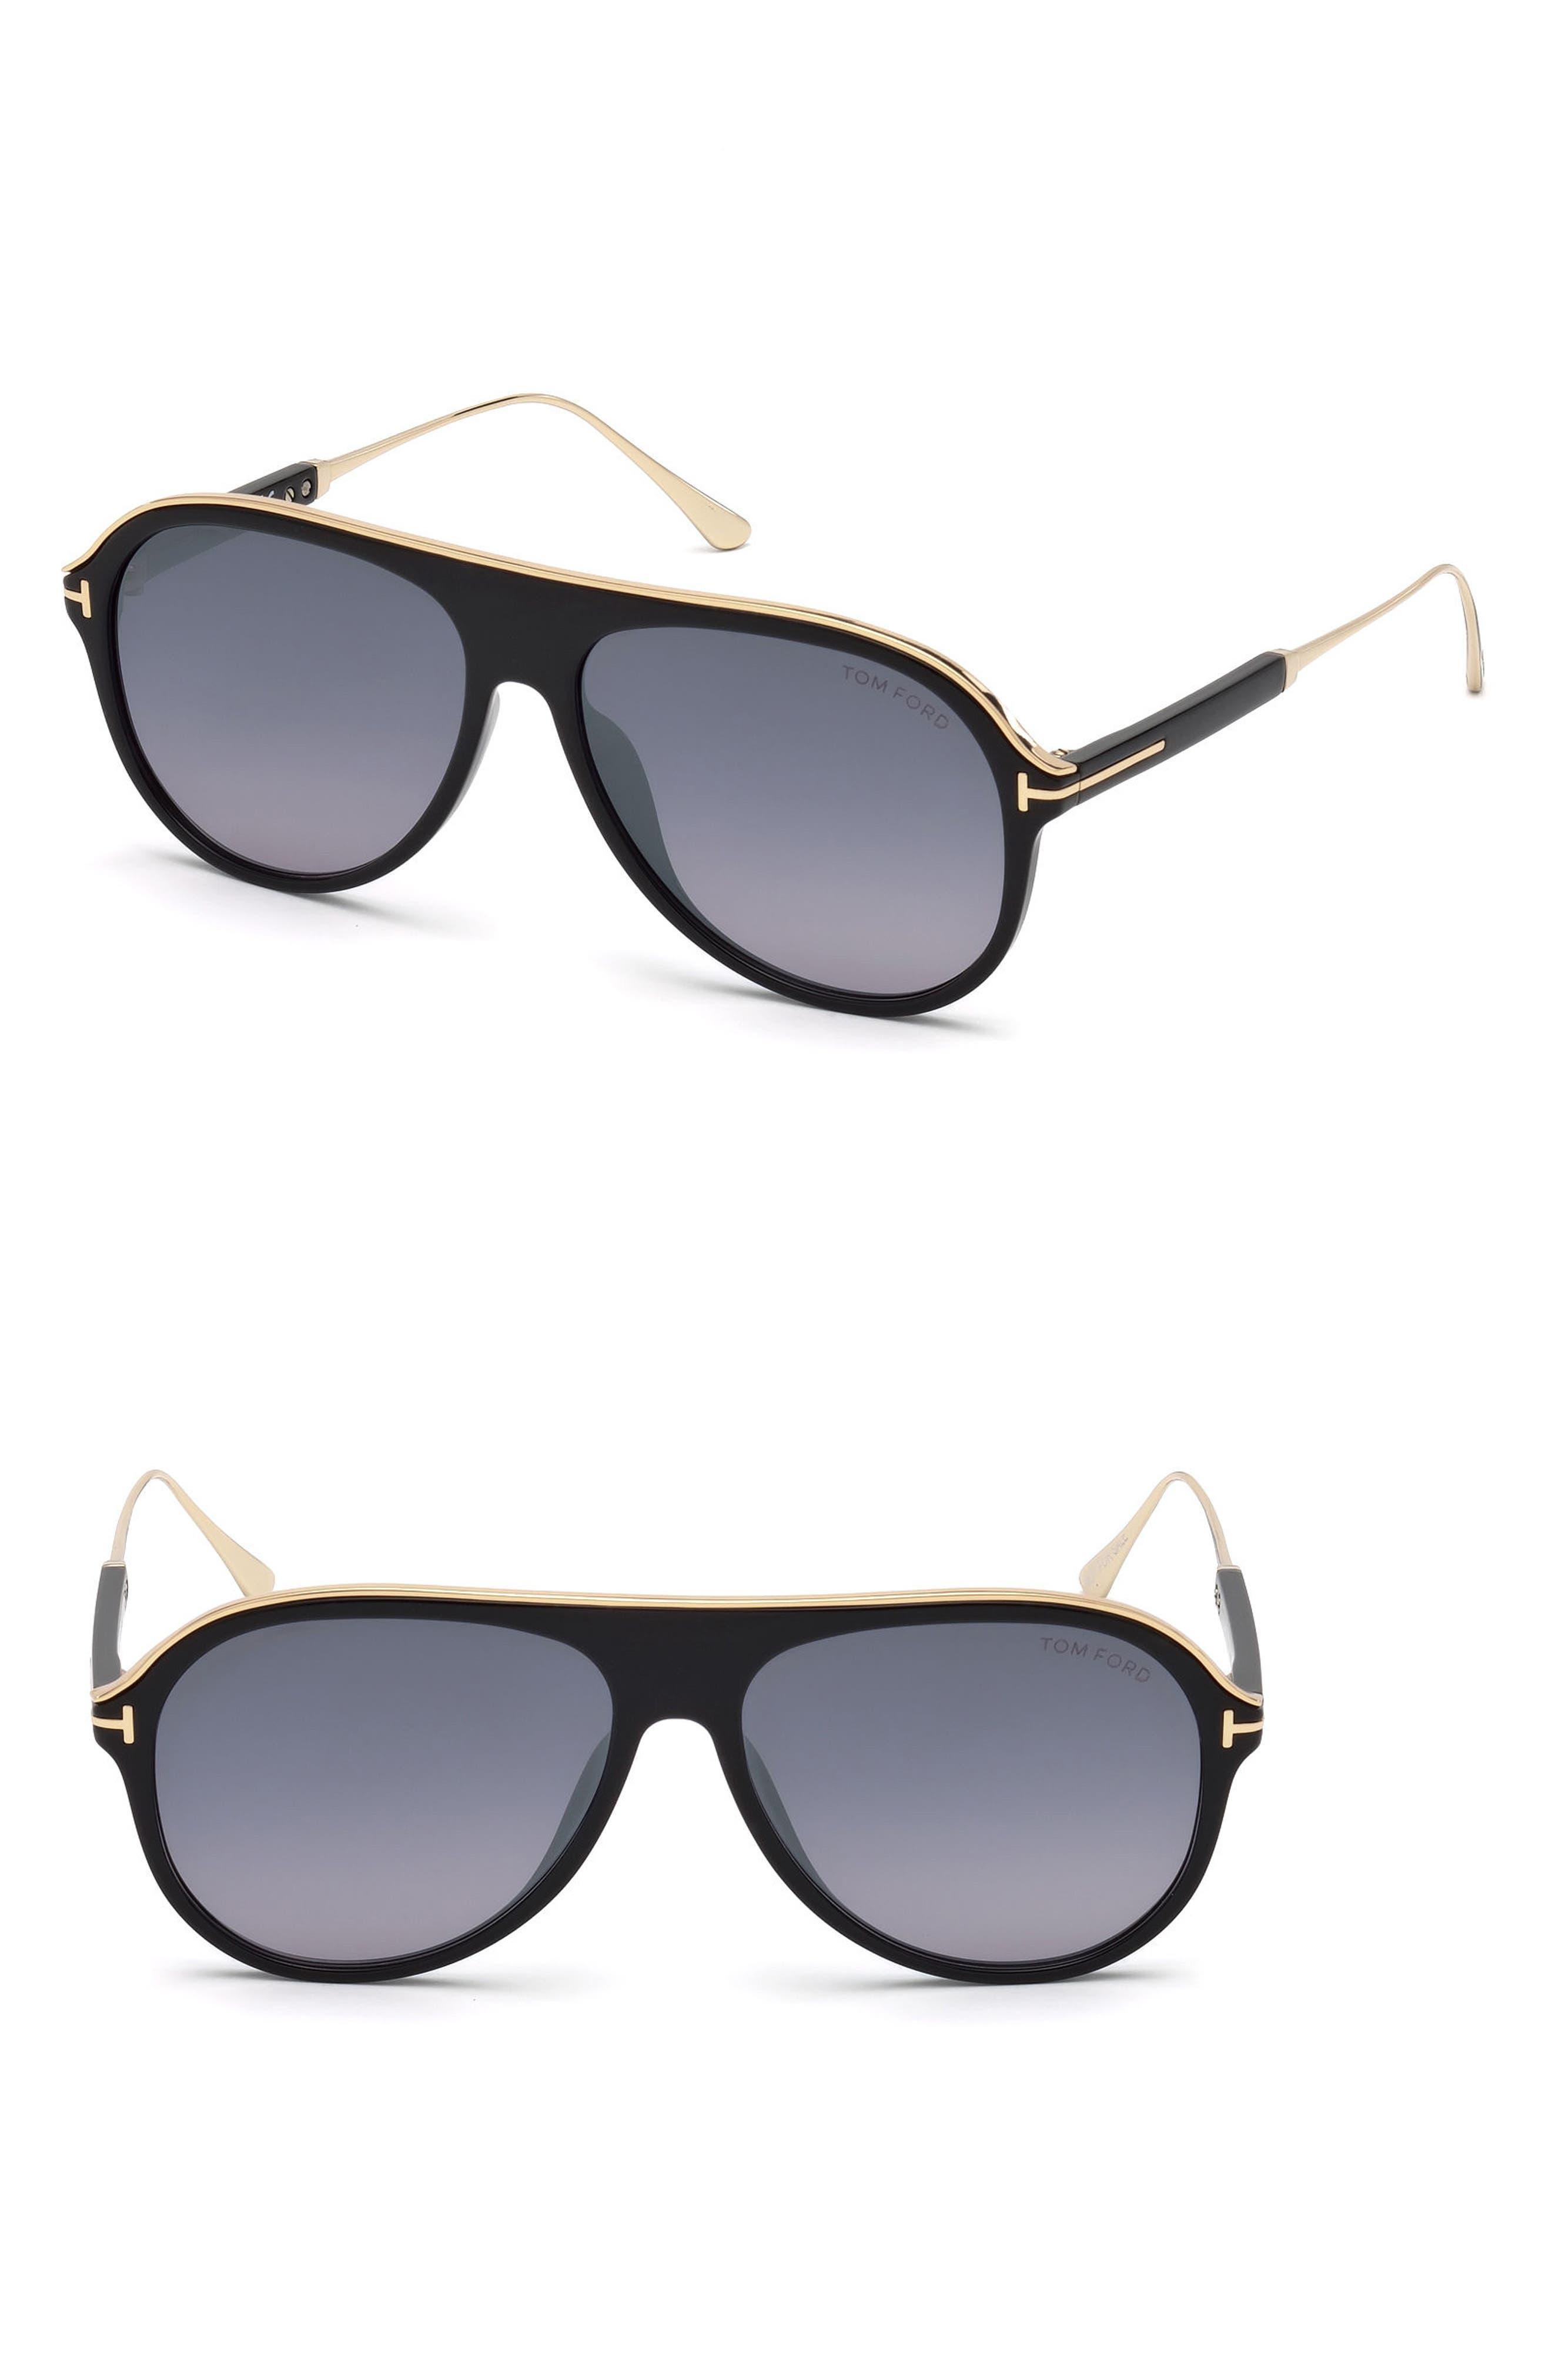 Nicholai-02 57mm Sunglasses,                             Main thumbnail 1, color,                             Shiny Black / Smoke Mirror